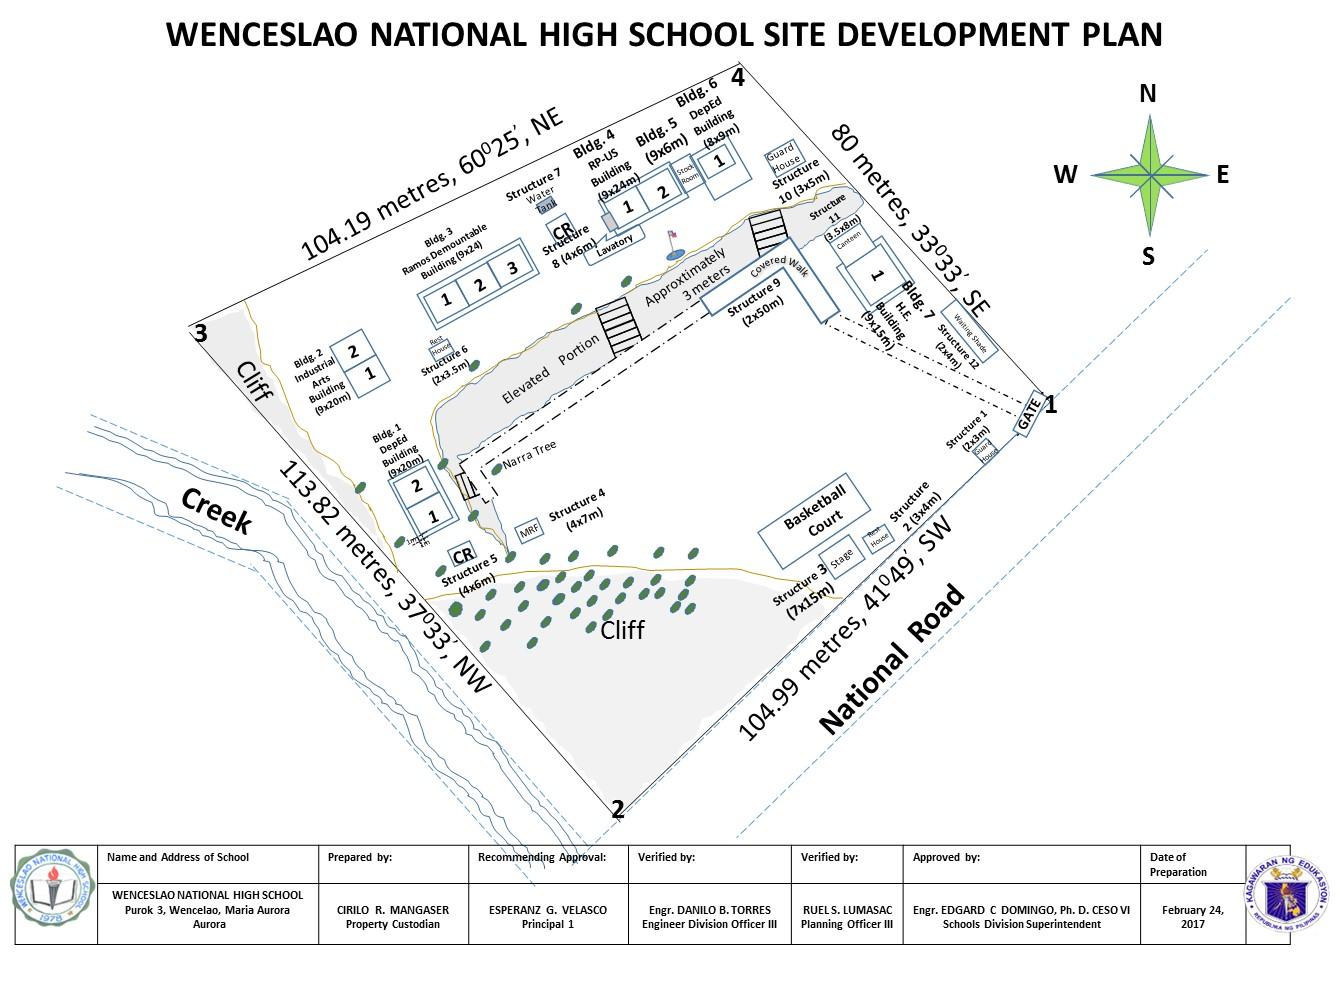 School Site Development Plan